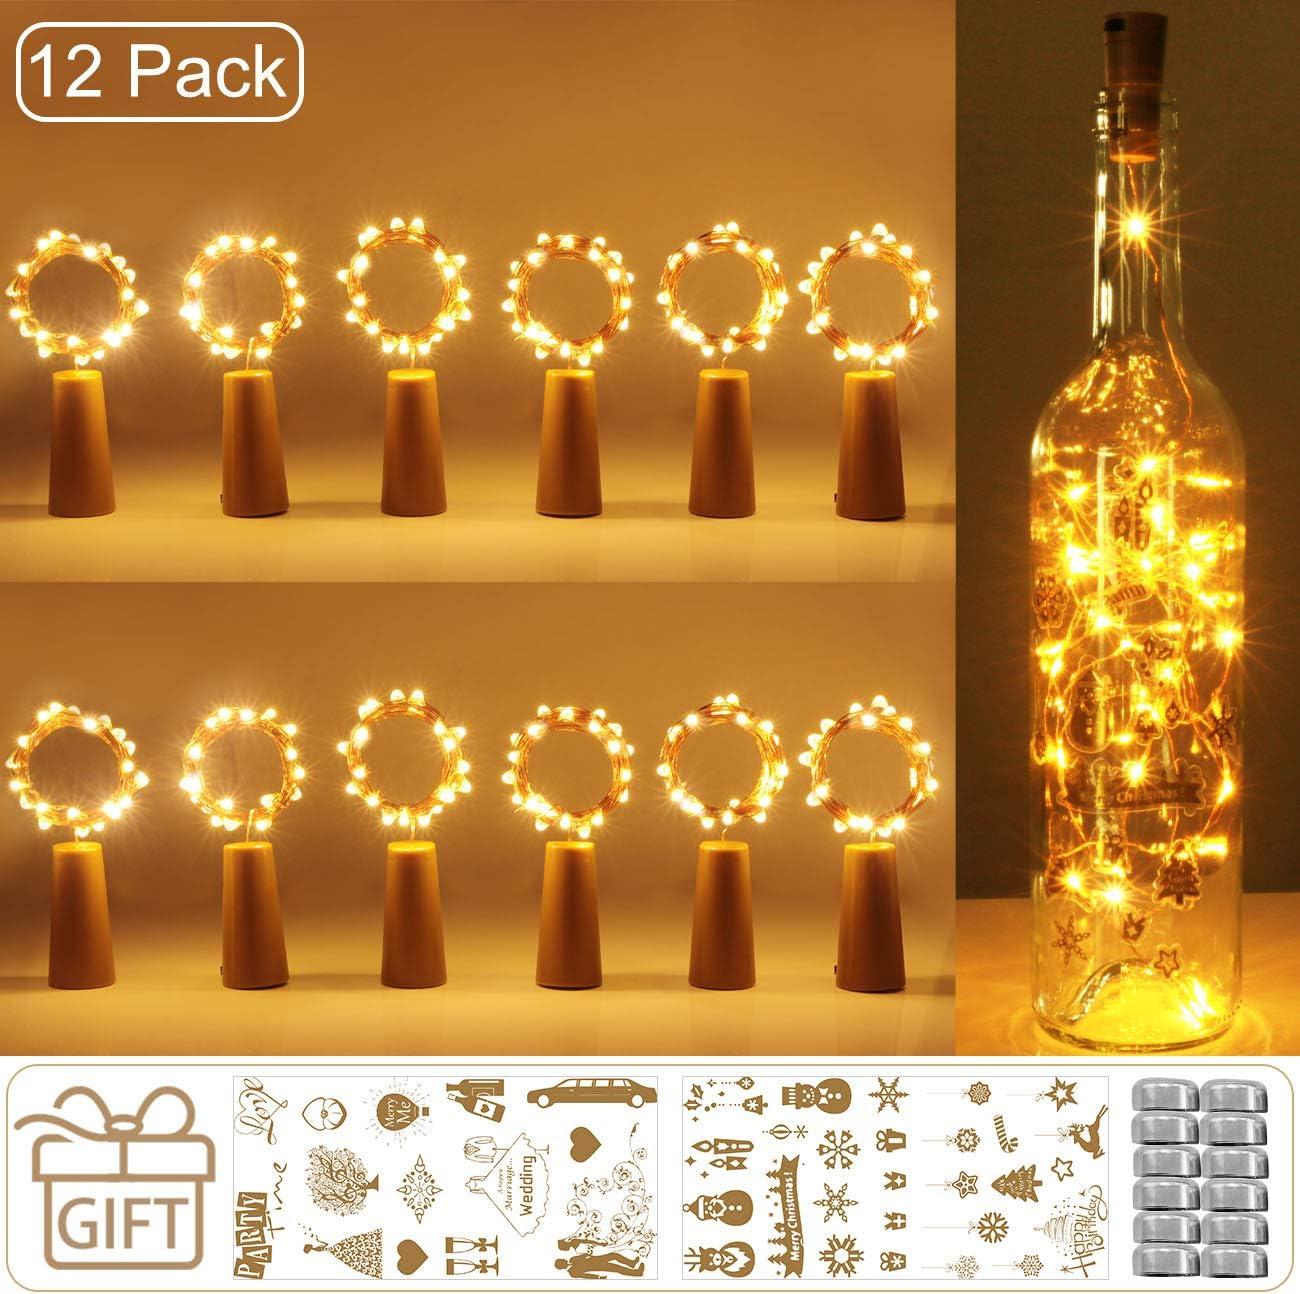 luz de Botella, Kolpop luz Corcho, luces led para Botellas de Vino 2m 20 LED a Pilas Decorativas Cobre Luz para Romántico Boda, Navidad, Fiesta, Hogar, Exterior, Jardín,Blanco Cálido(12 Pack)